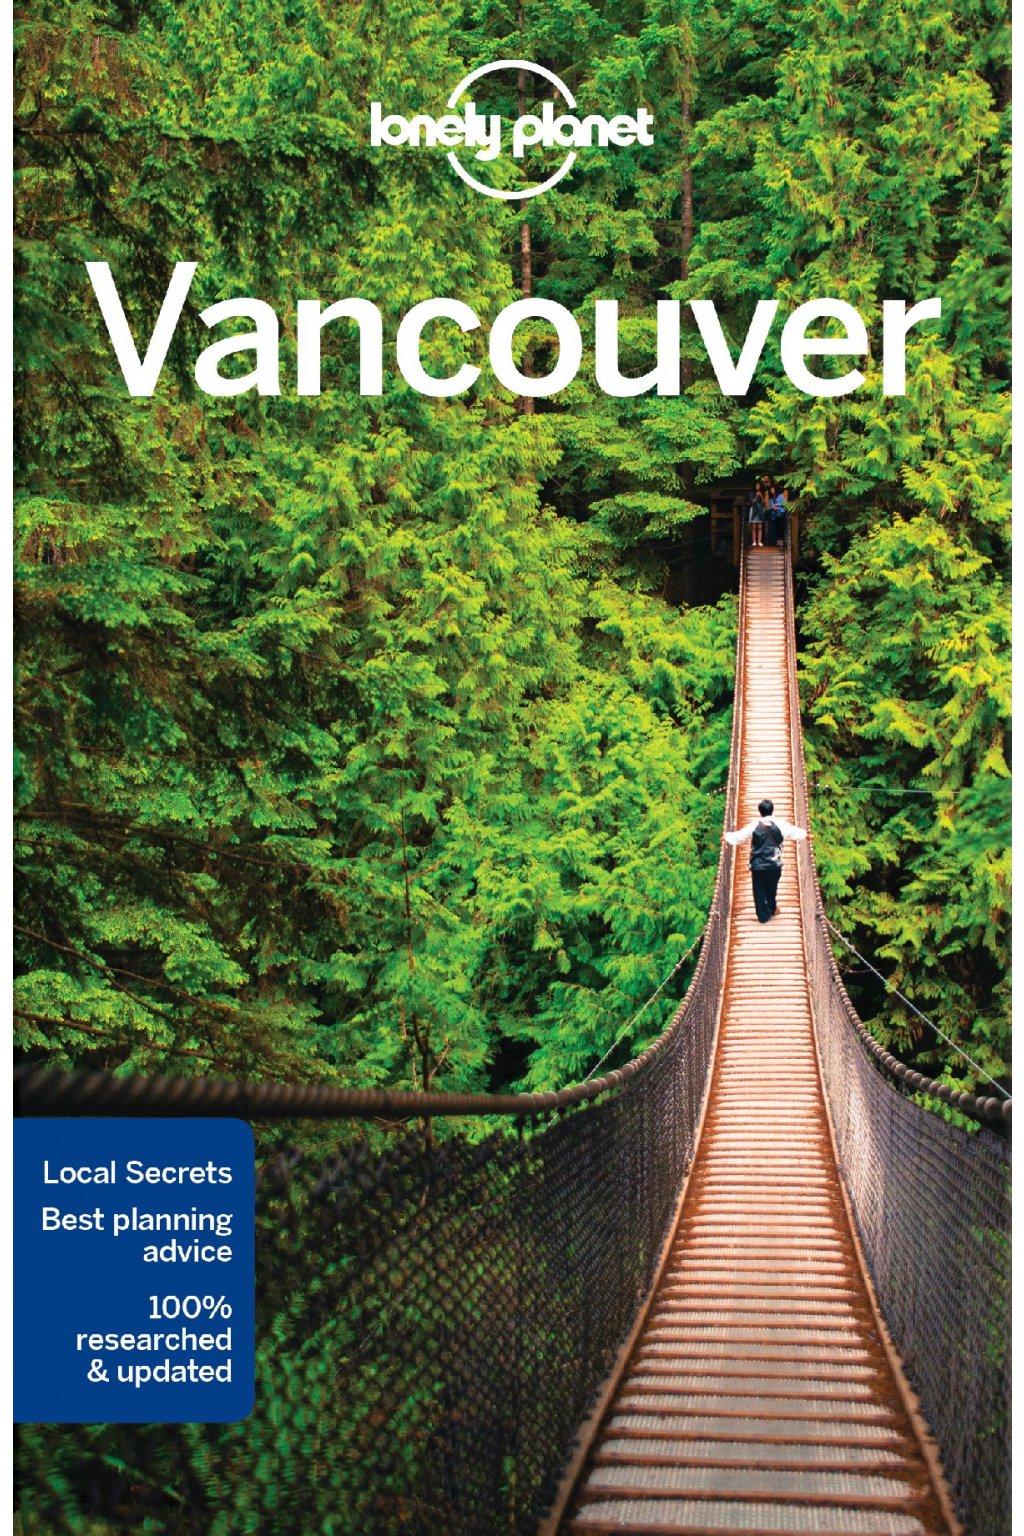 55295 Vancouver 7 tg 9781786573339